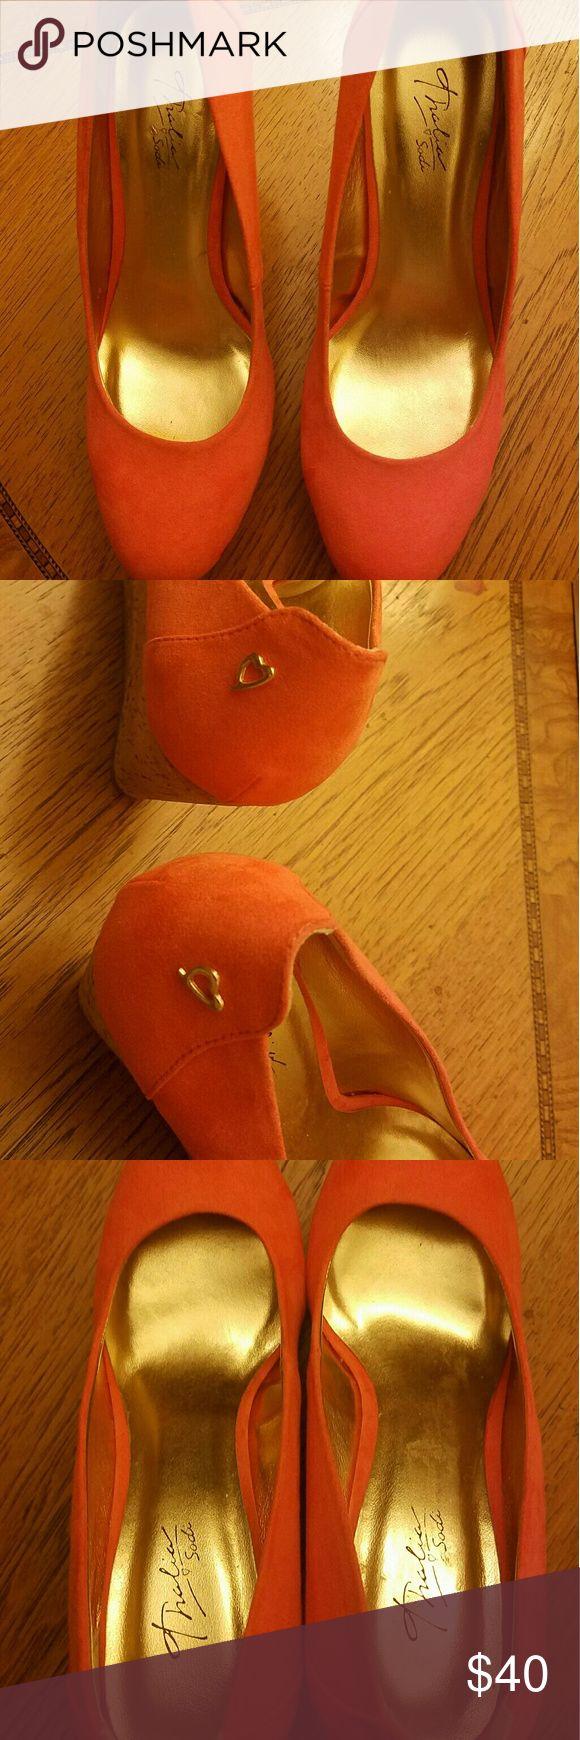 Thalia Sodi Orange Wedge Pumps Thalia Sodi Orange Wedge Pumps, heart detail on shoes  ☆☆Shoes never worn, only tried on ☆☆ Thalia Sodi Shoes Platforms